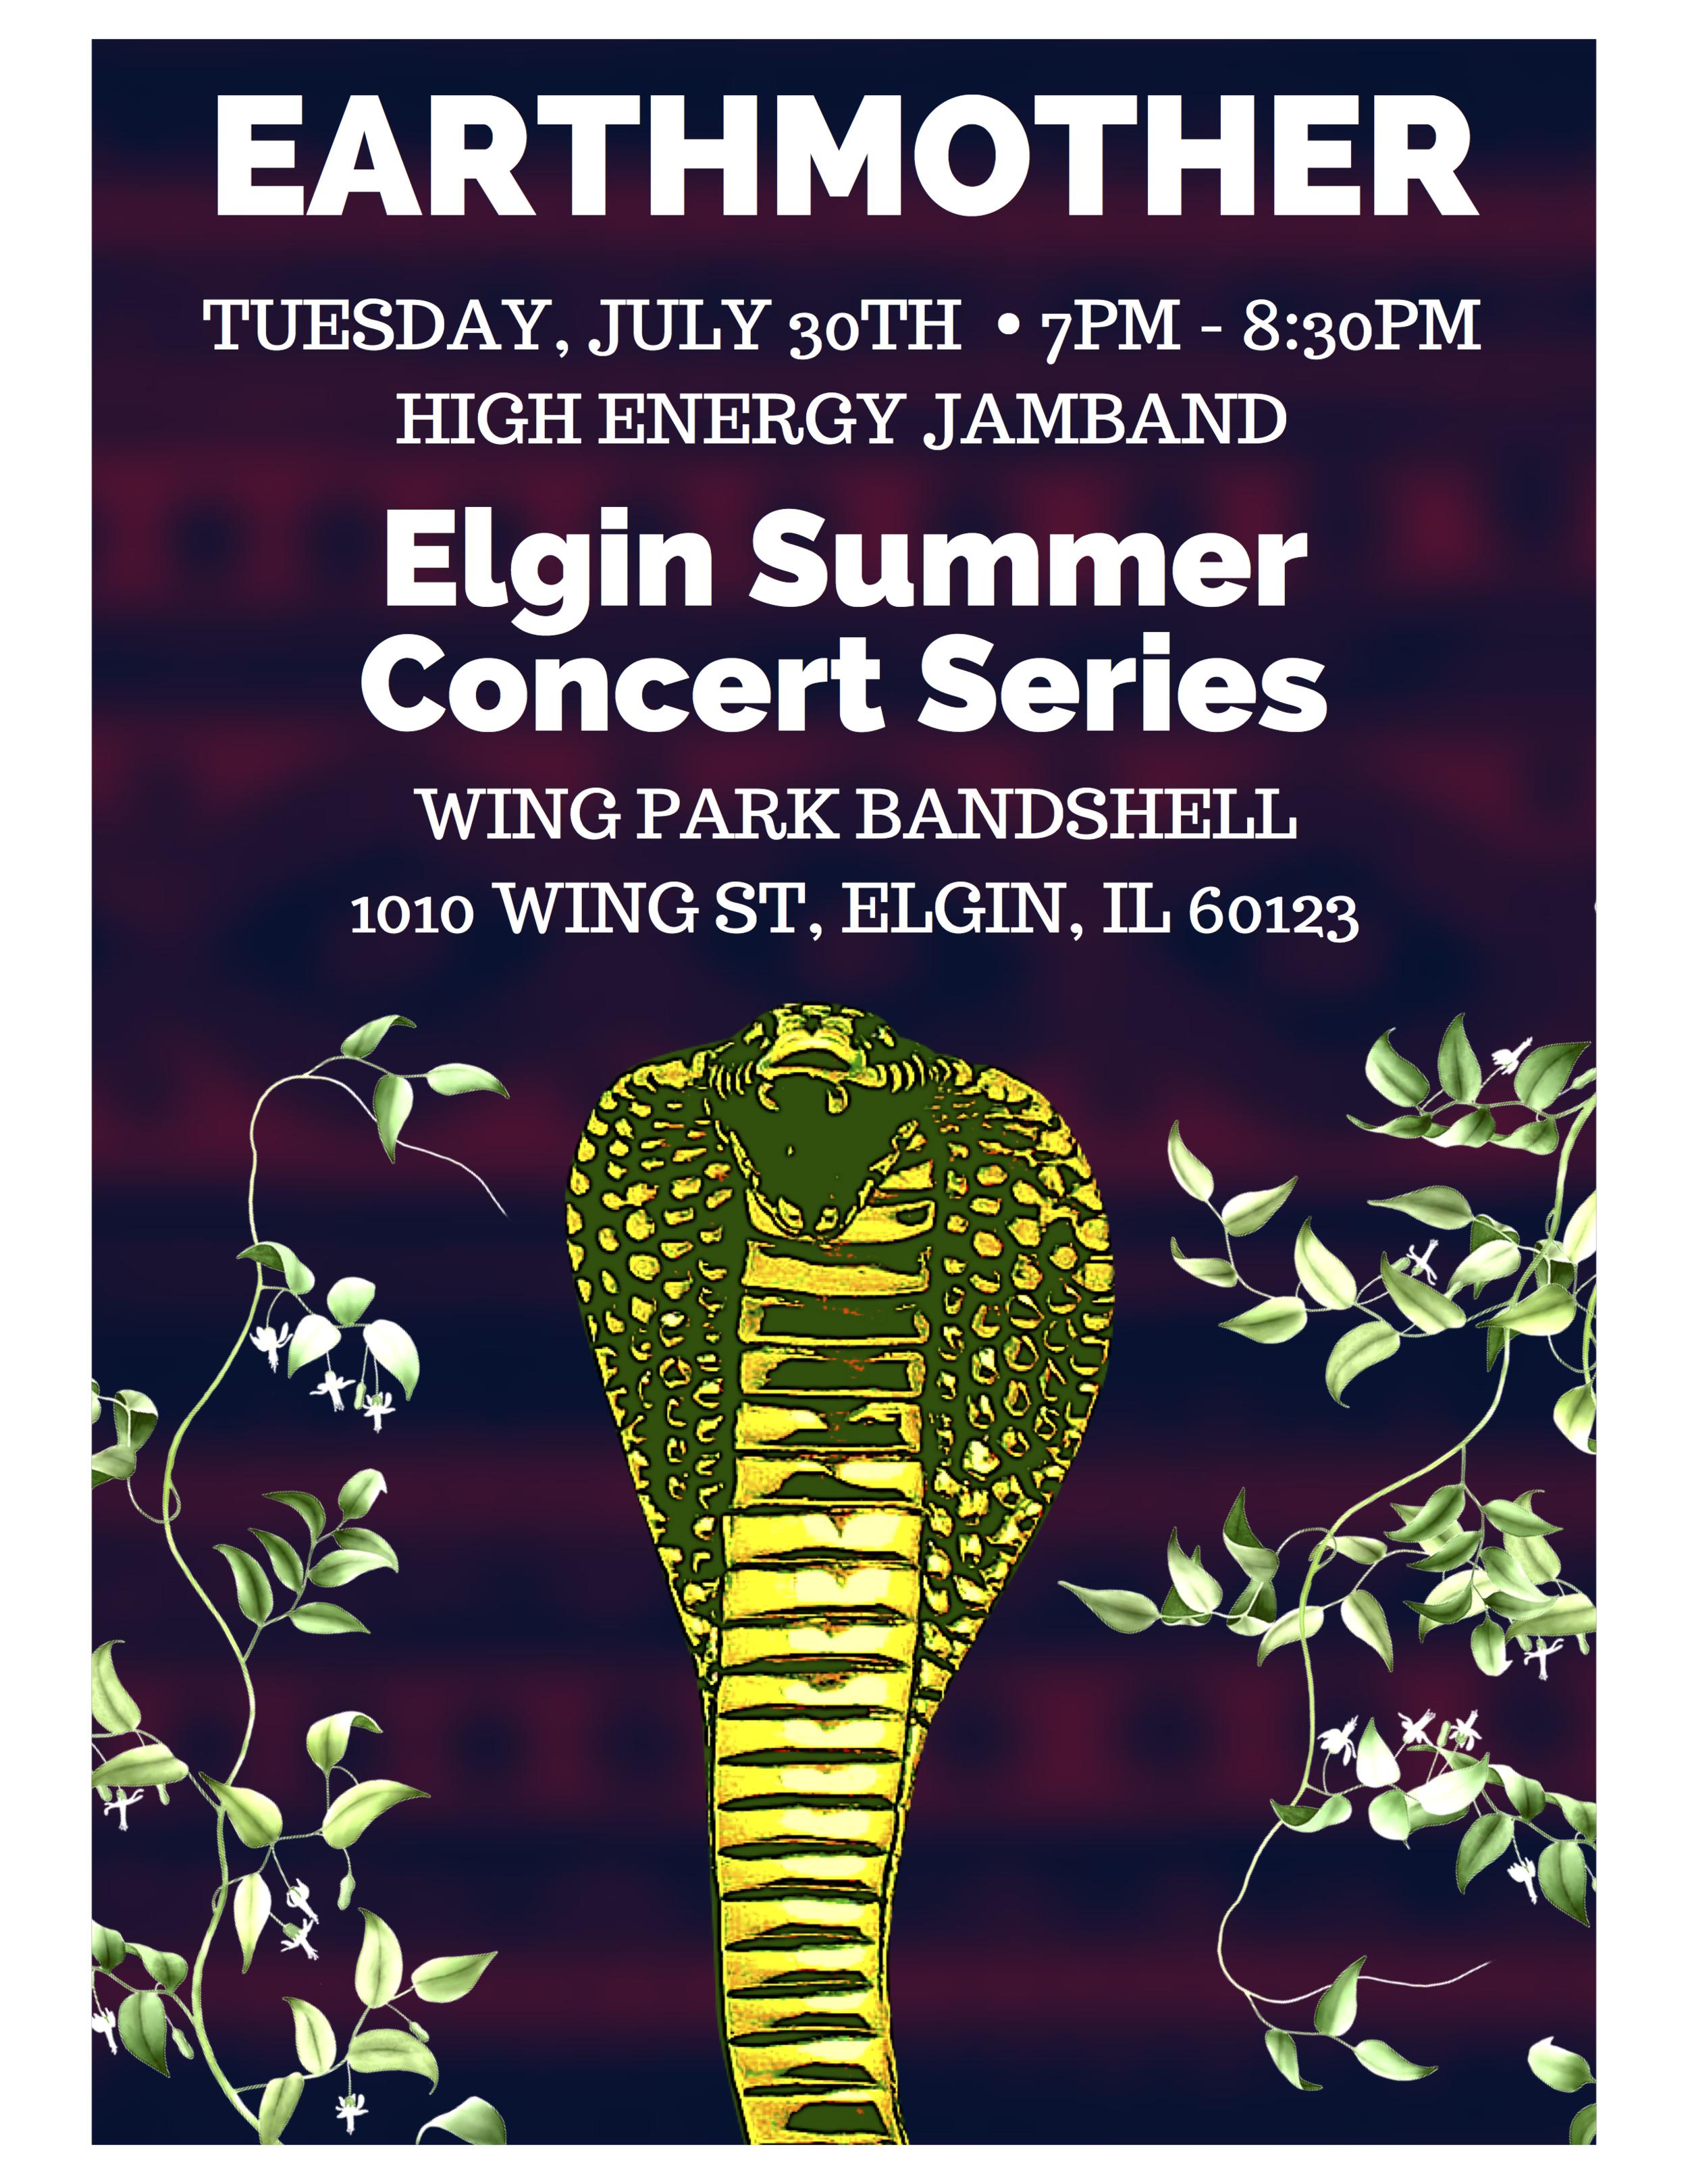 elgin summer concert series.png